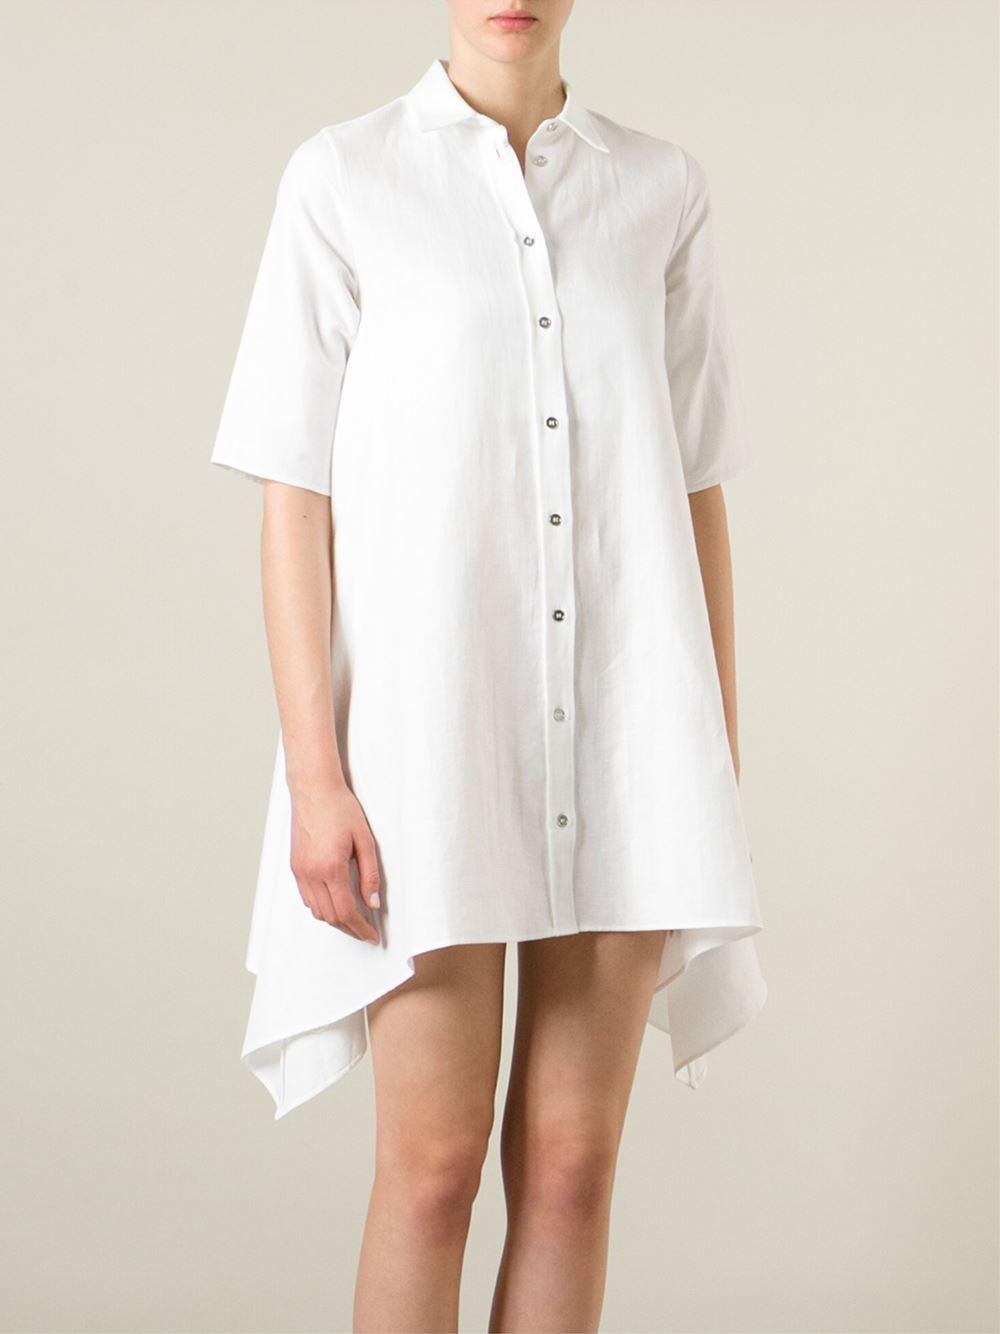 Mm6 By Maison Martin Margiela Button Up Shirt Dress In